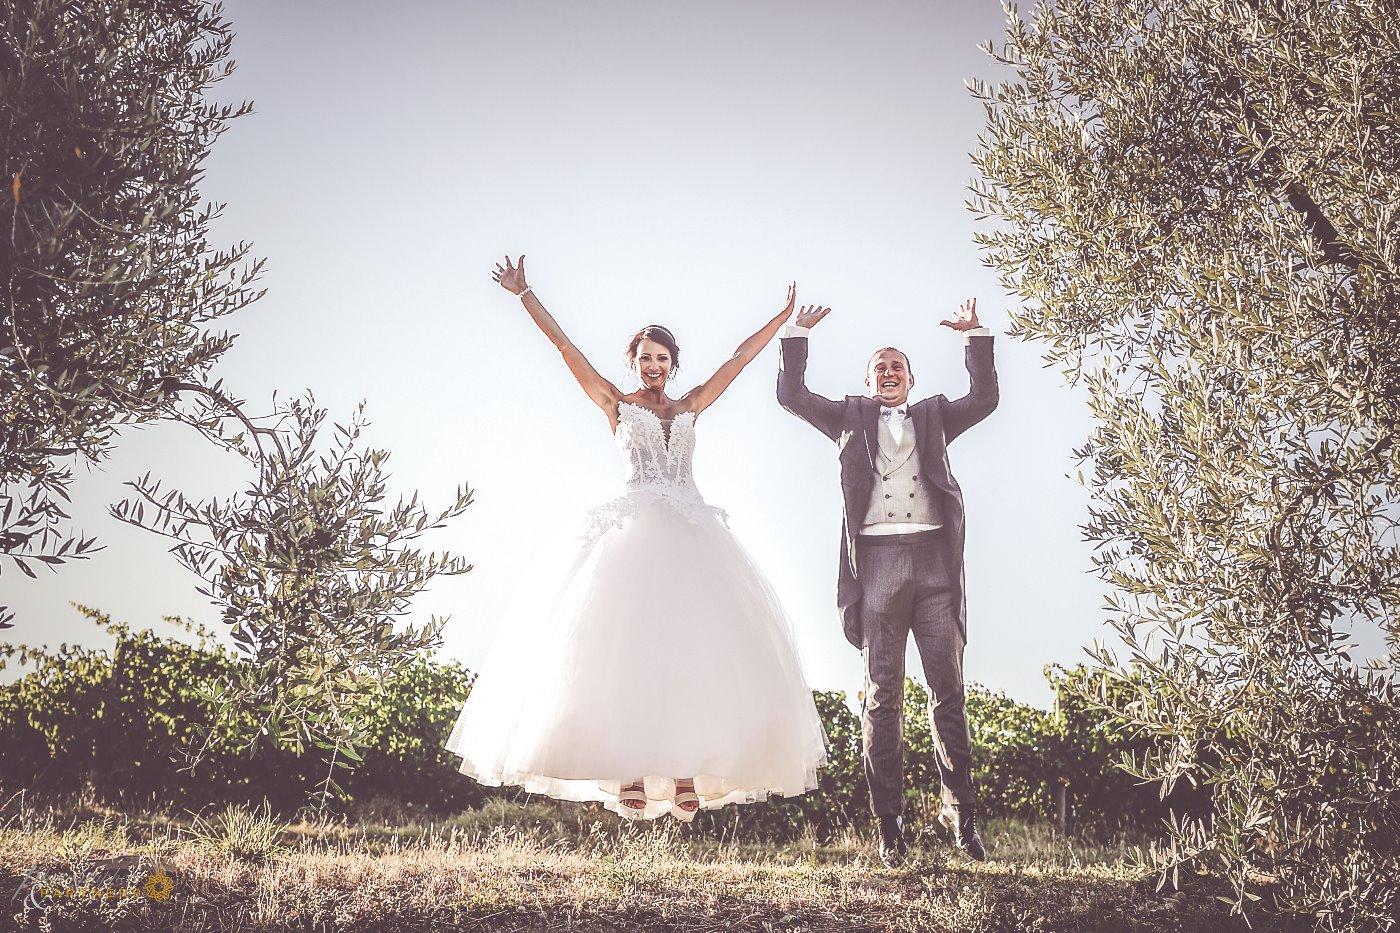 photography_weddings_vicchiomaggio_15.jpg